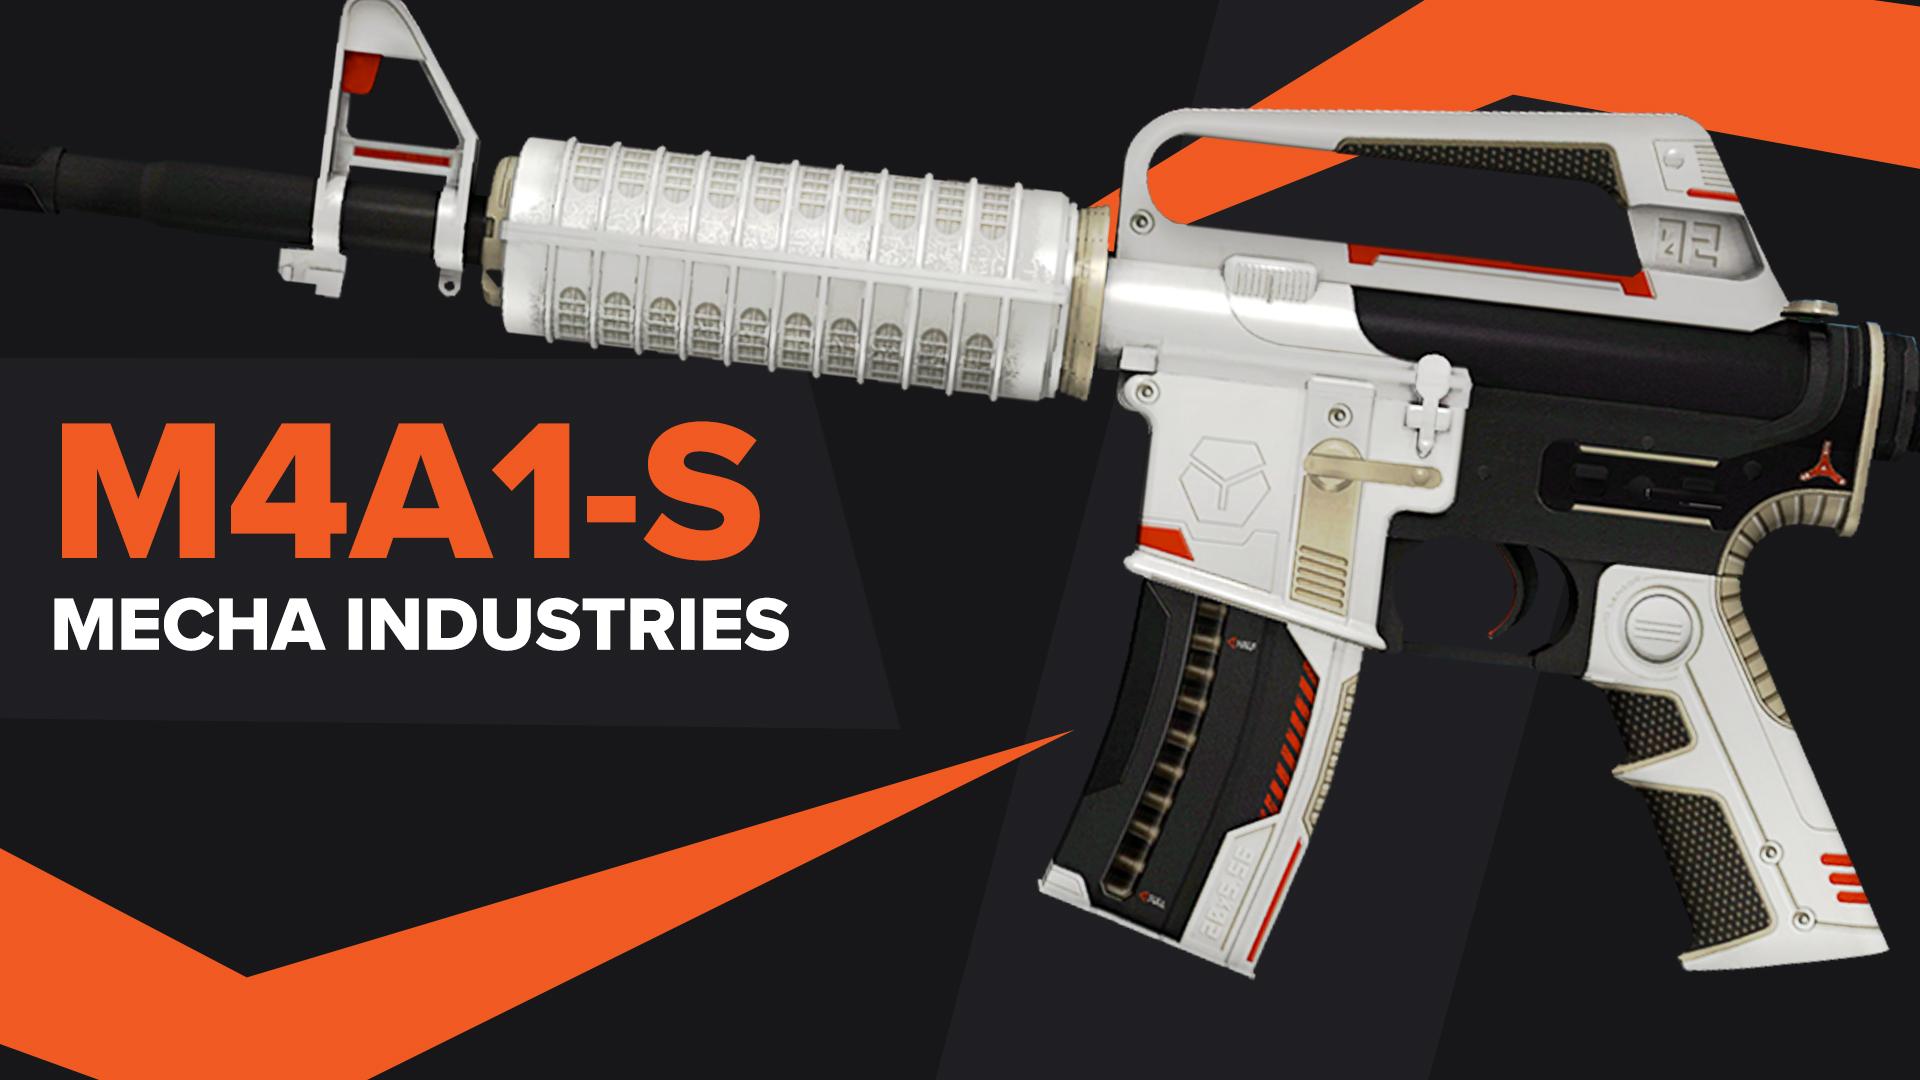 Mecha Industries CSGO Skin M4A1S